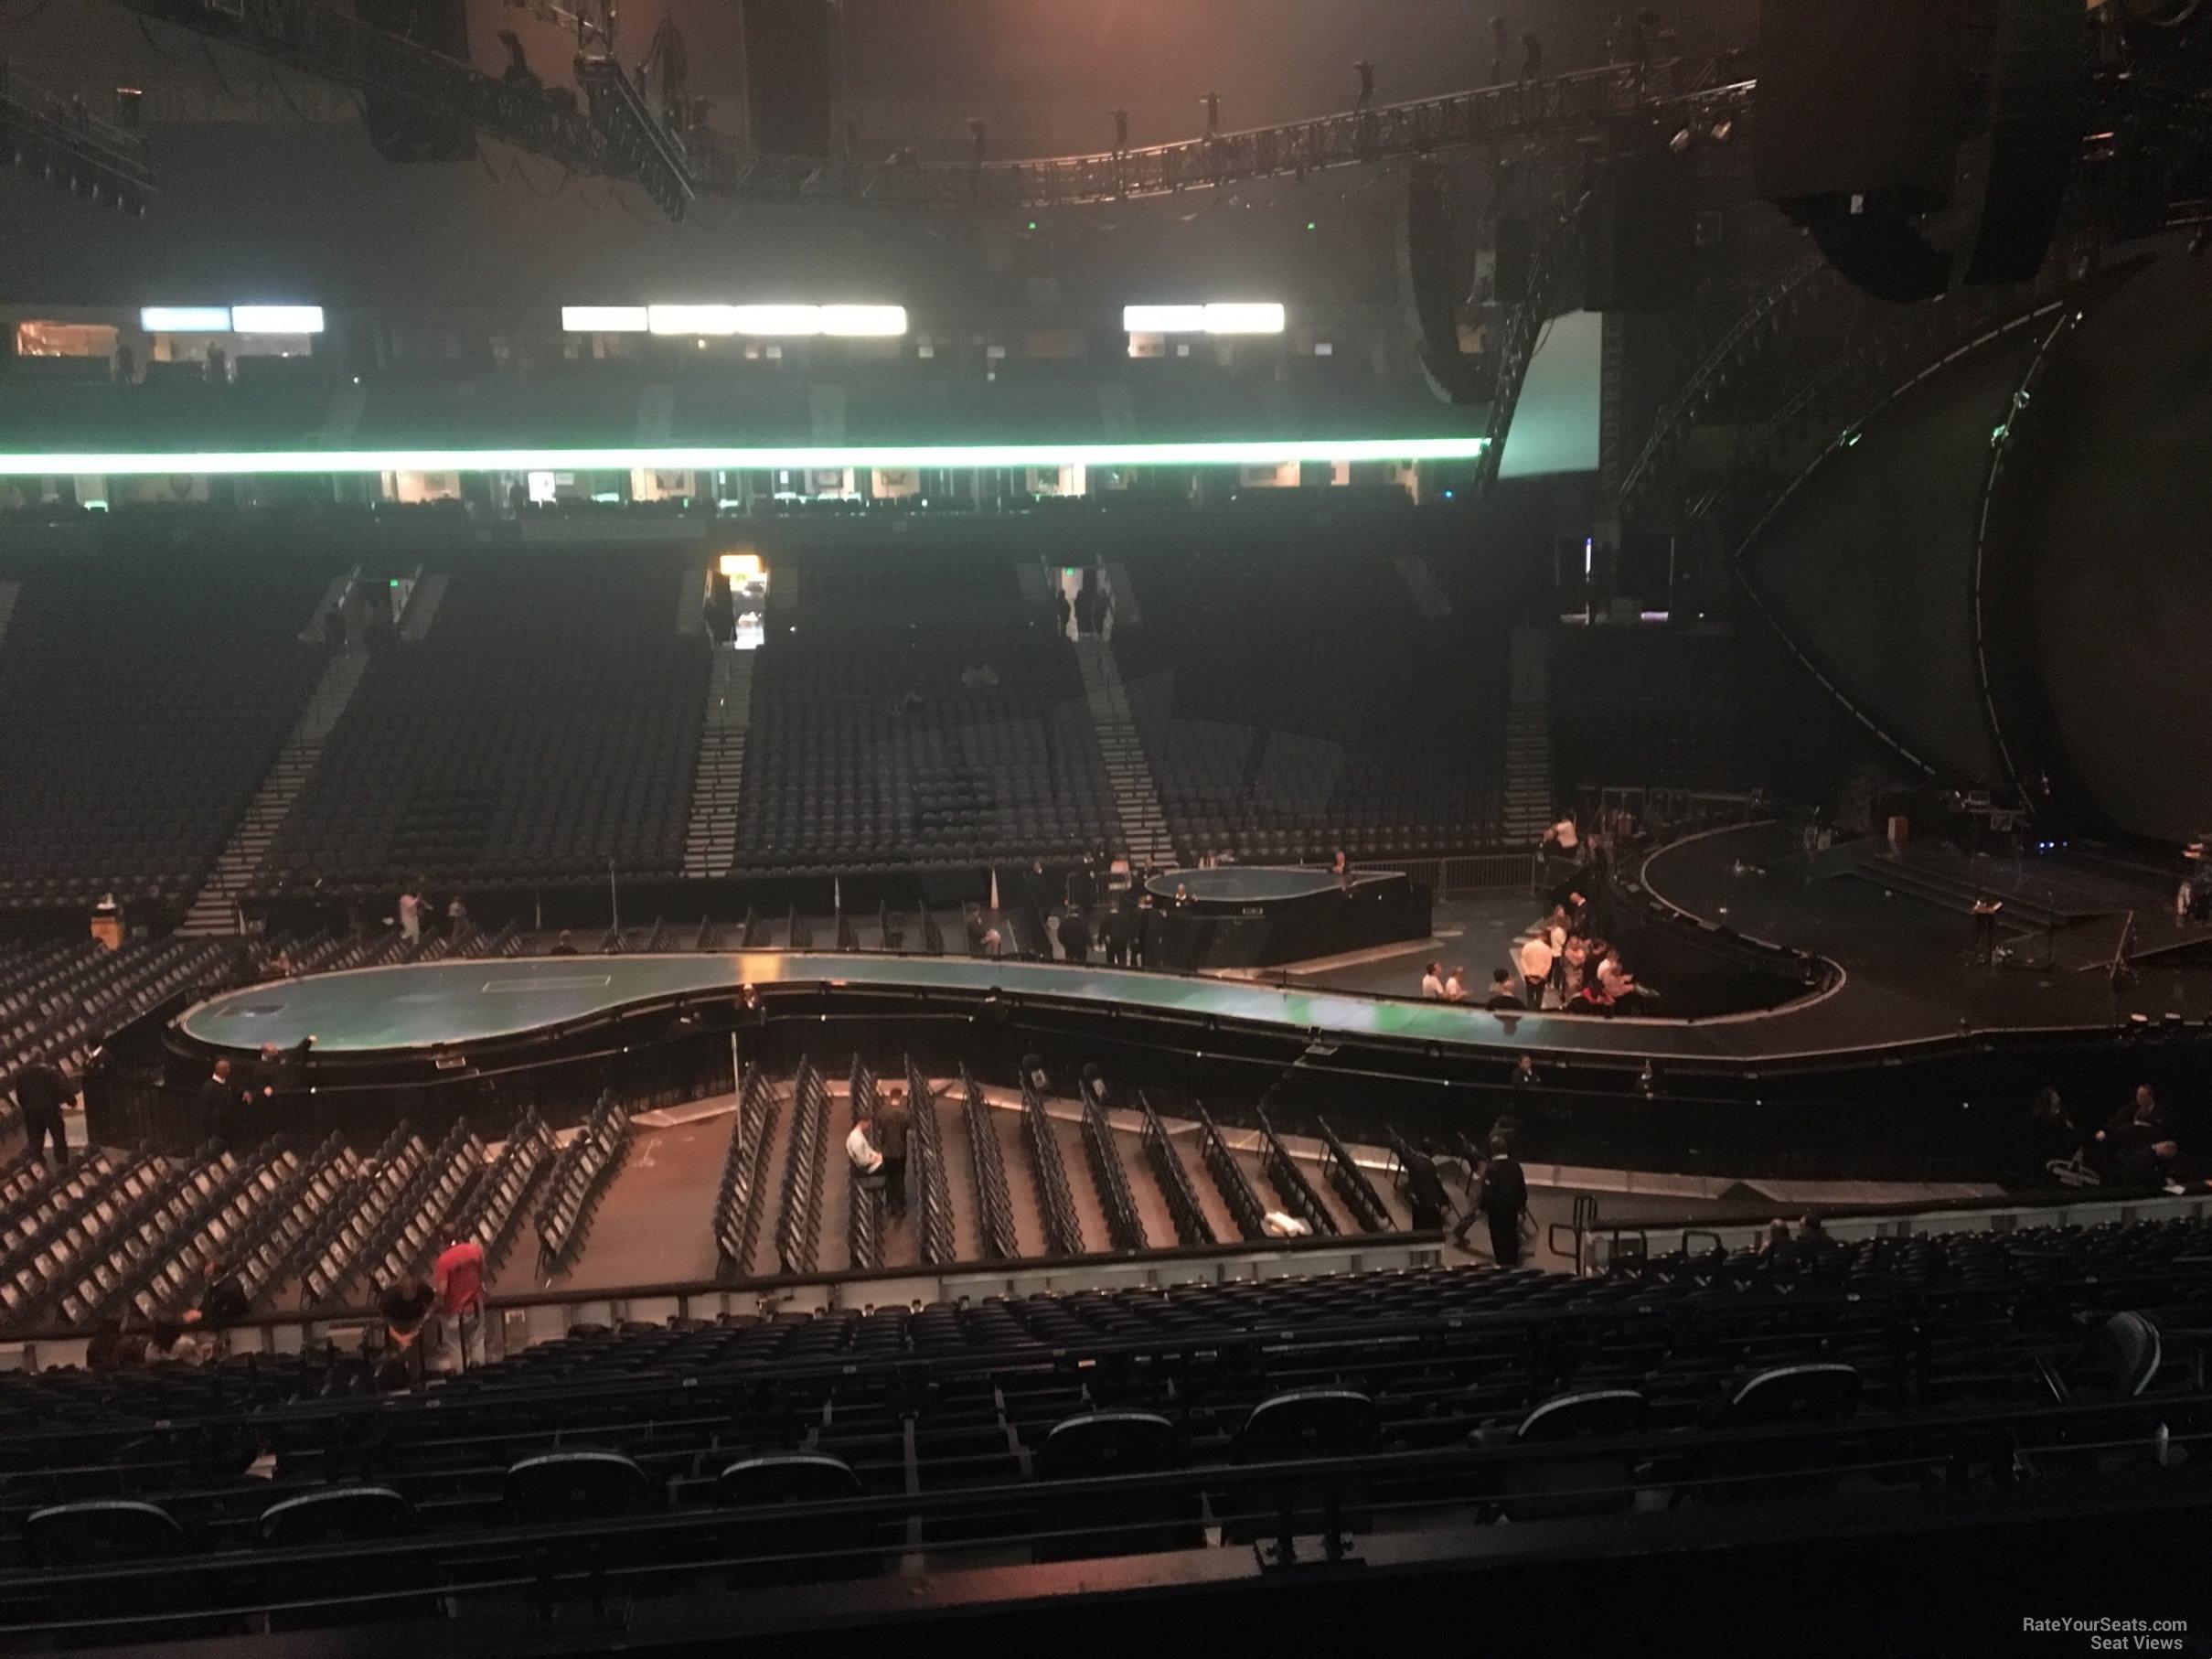 bridgestone arena seat views